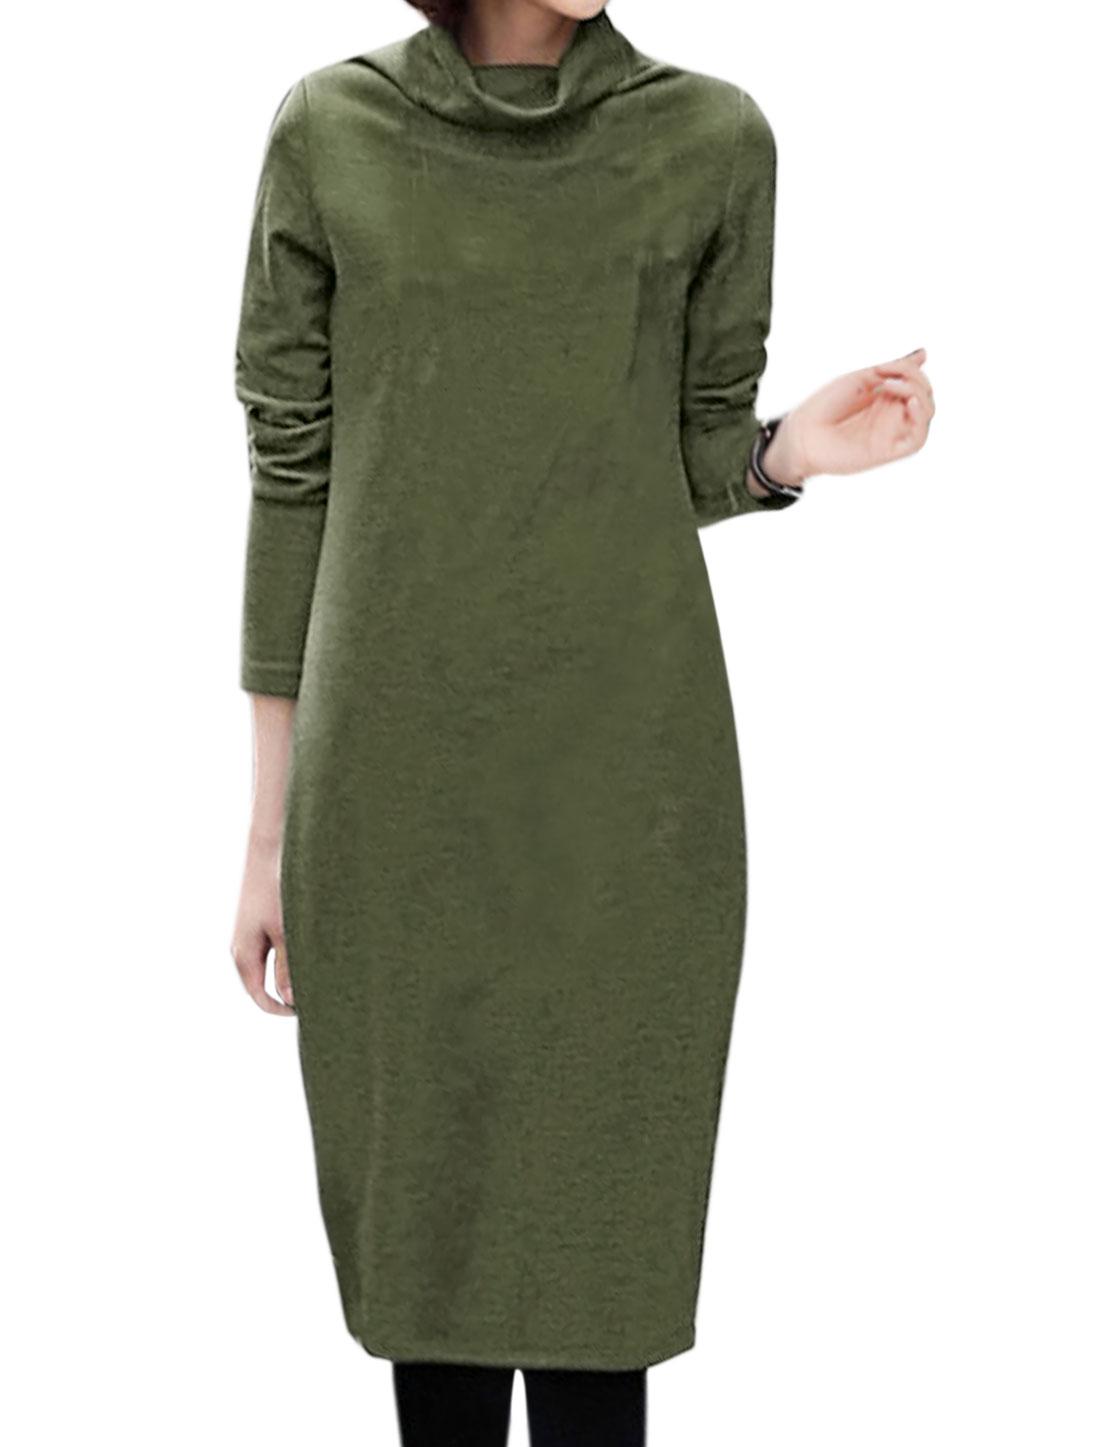 Women Cowl Neck Long Sleeves Slim Fit Knee Length Pullover Sheath Dress Green M